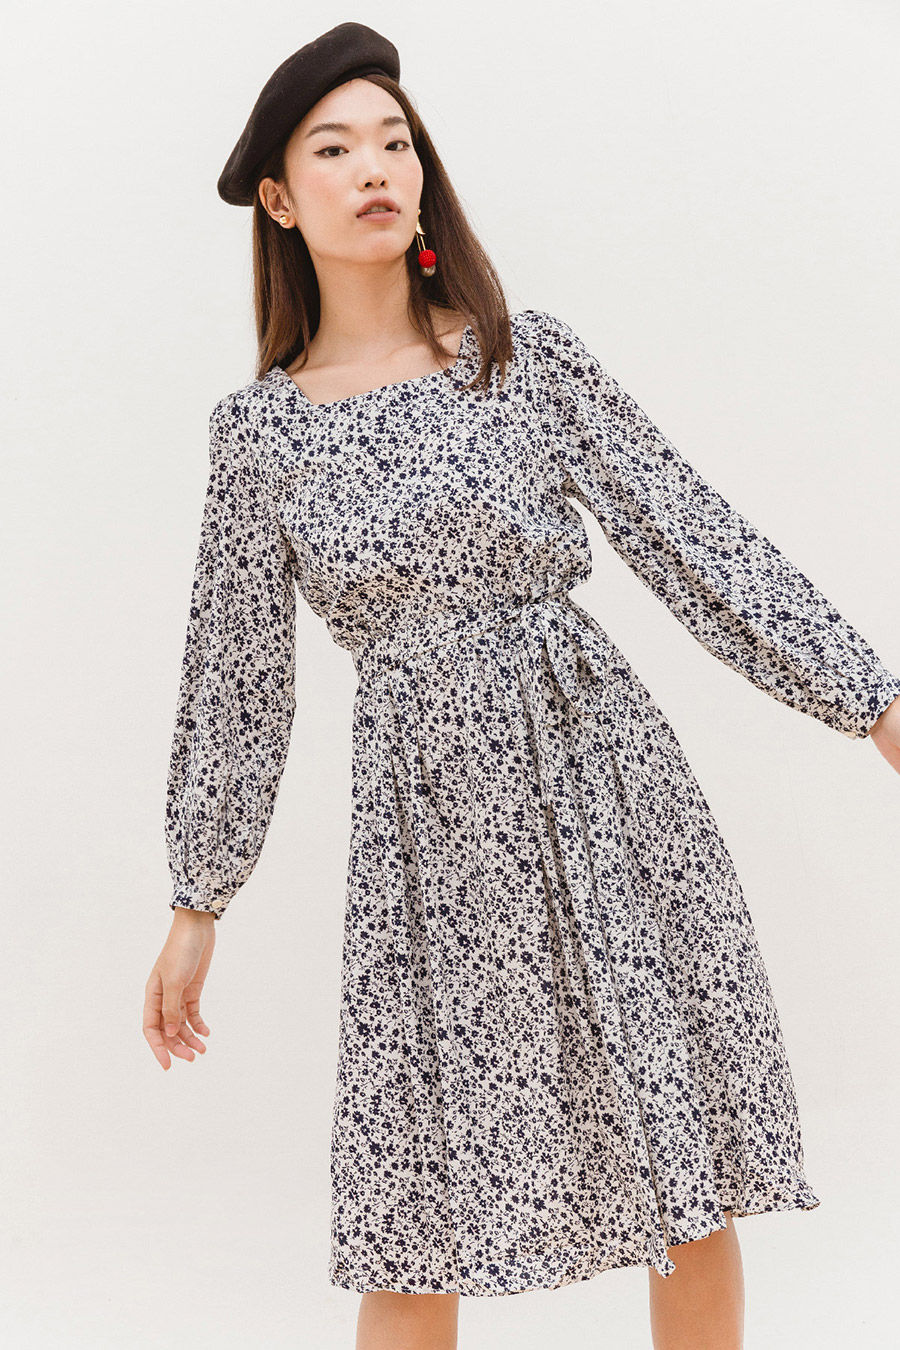 *SALE* CALI DRESS - SASHA